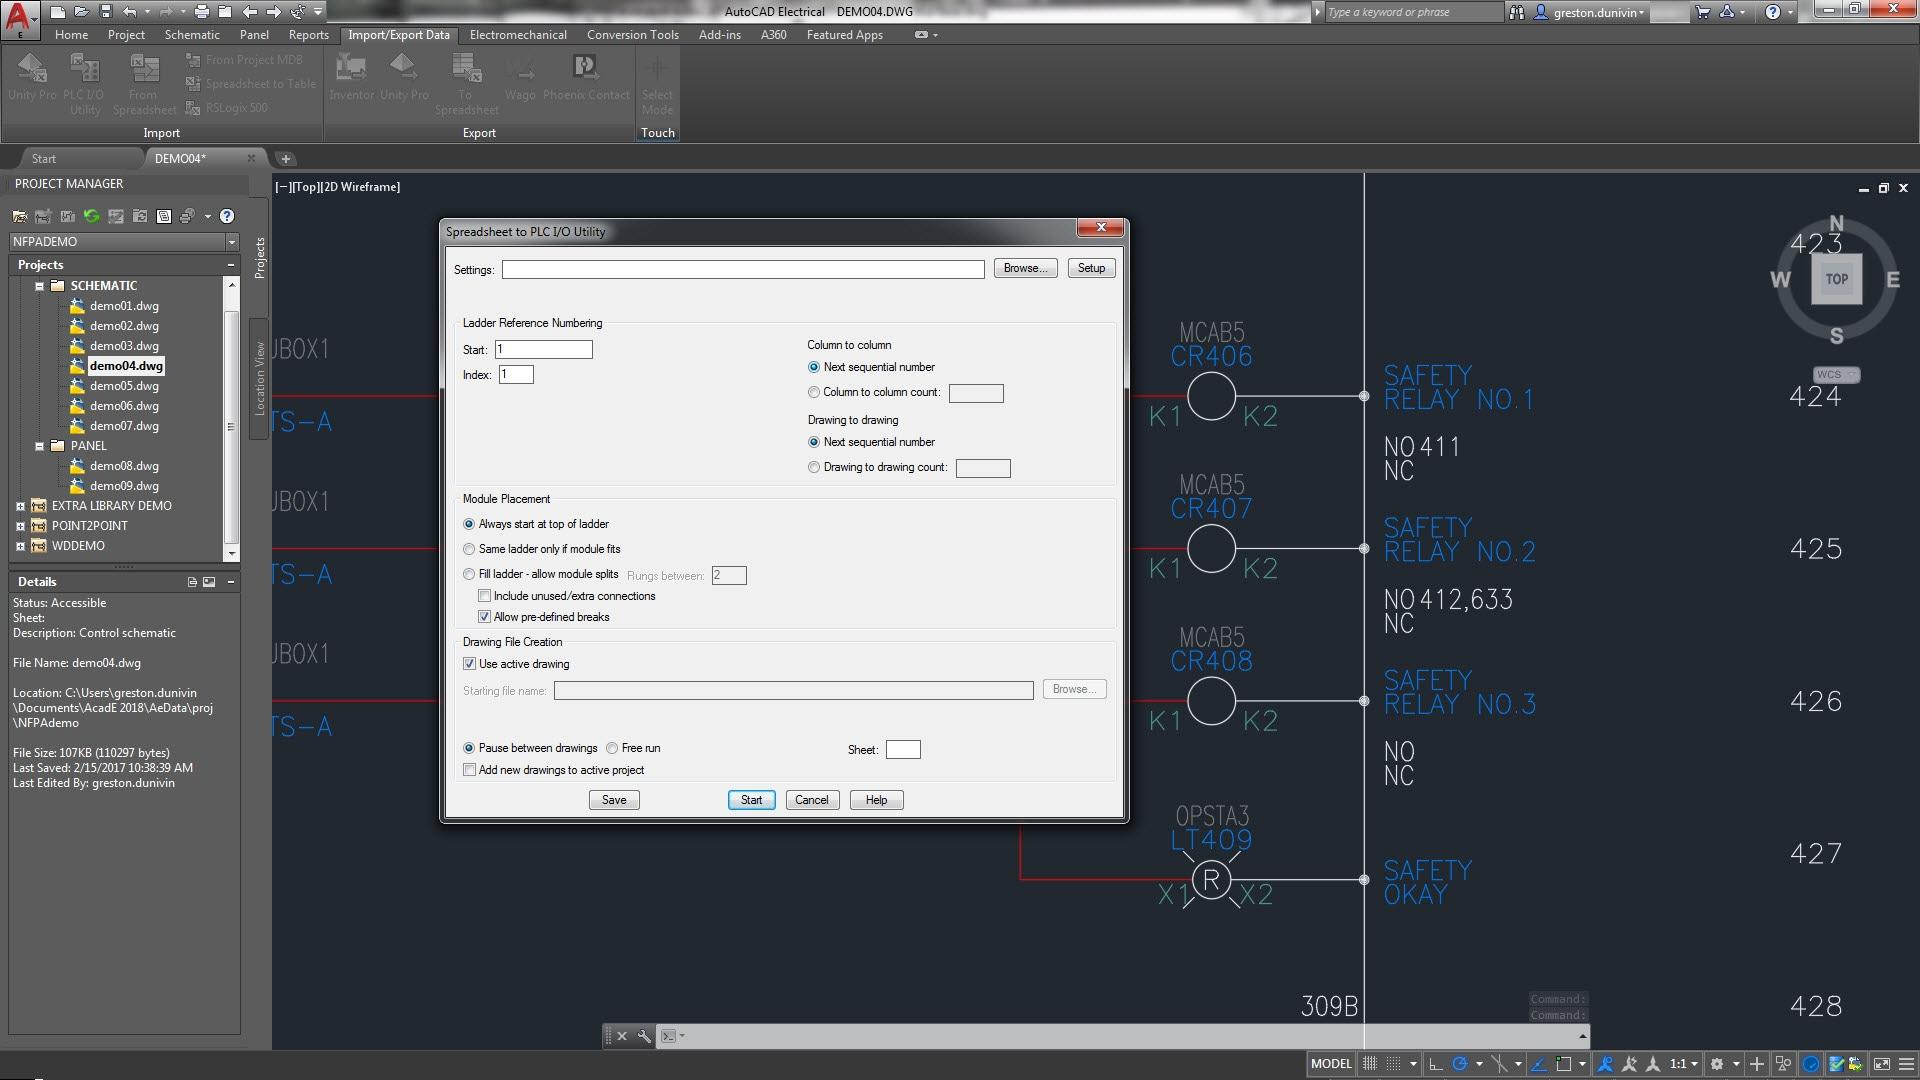 Schemi Elettrici Unifilari E Multifilari : Set di strumenti autocad electrical software per la